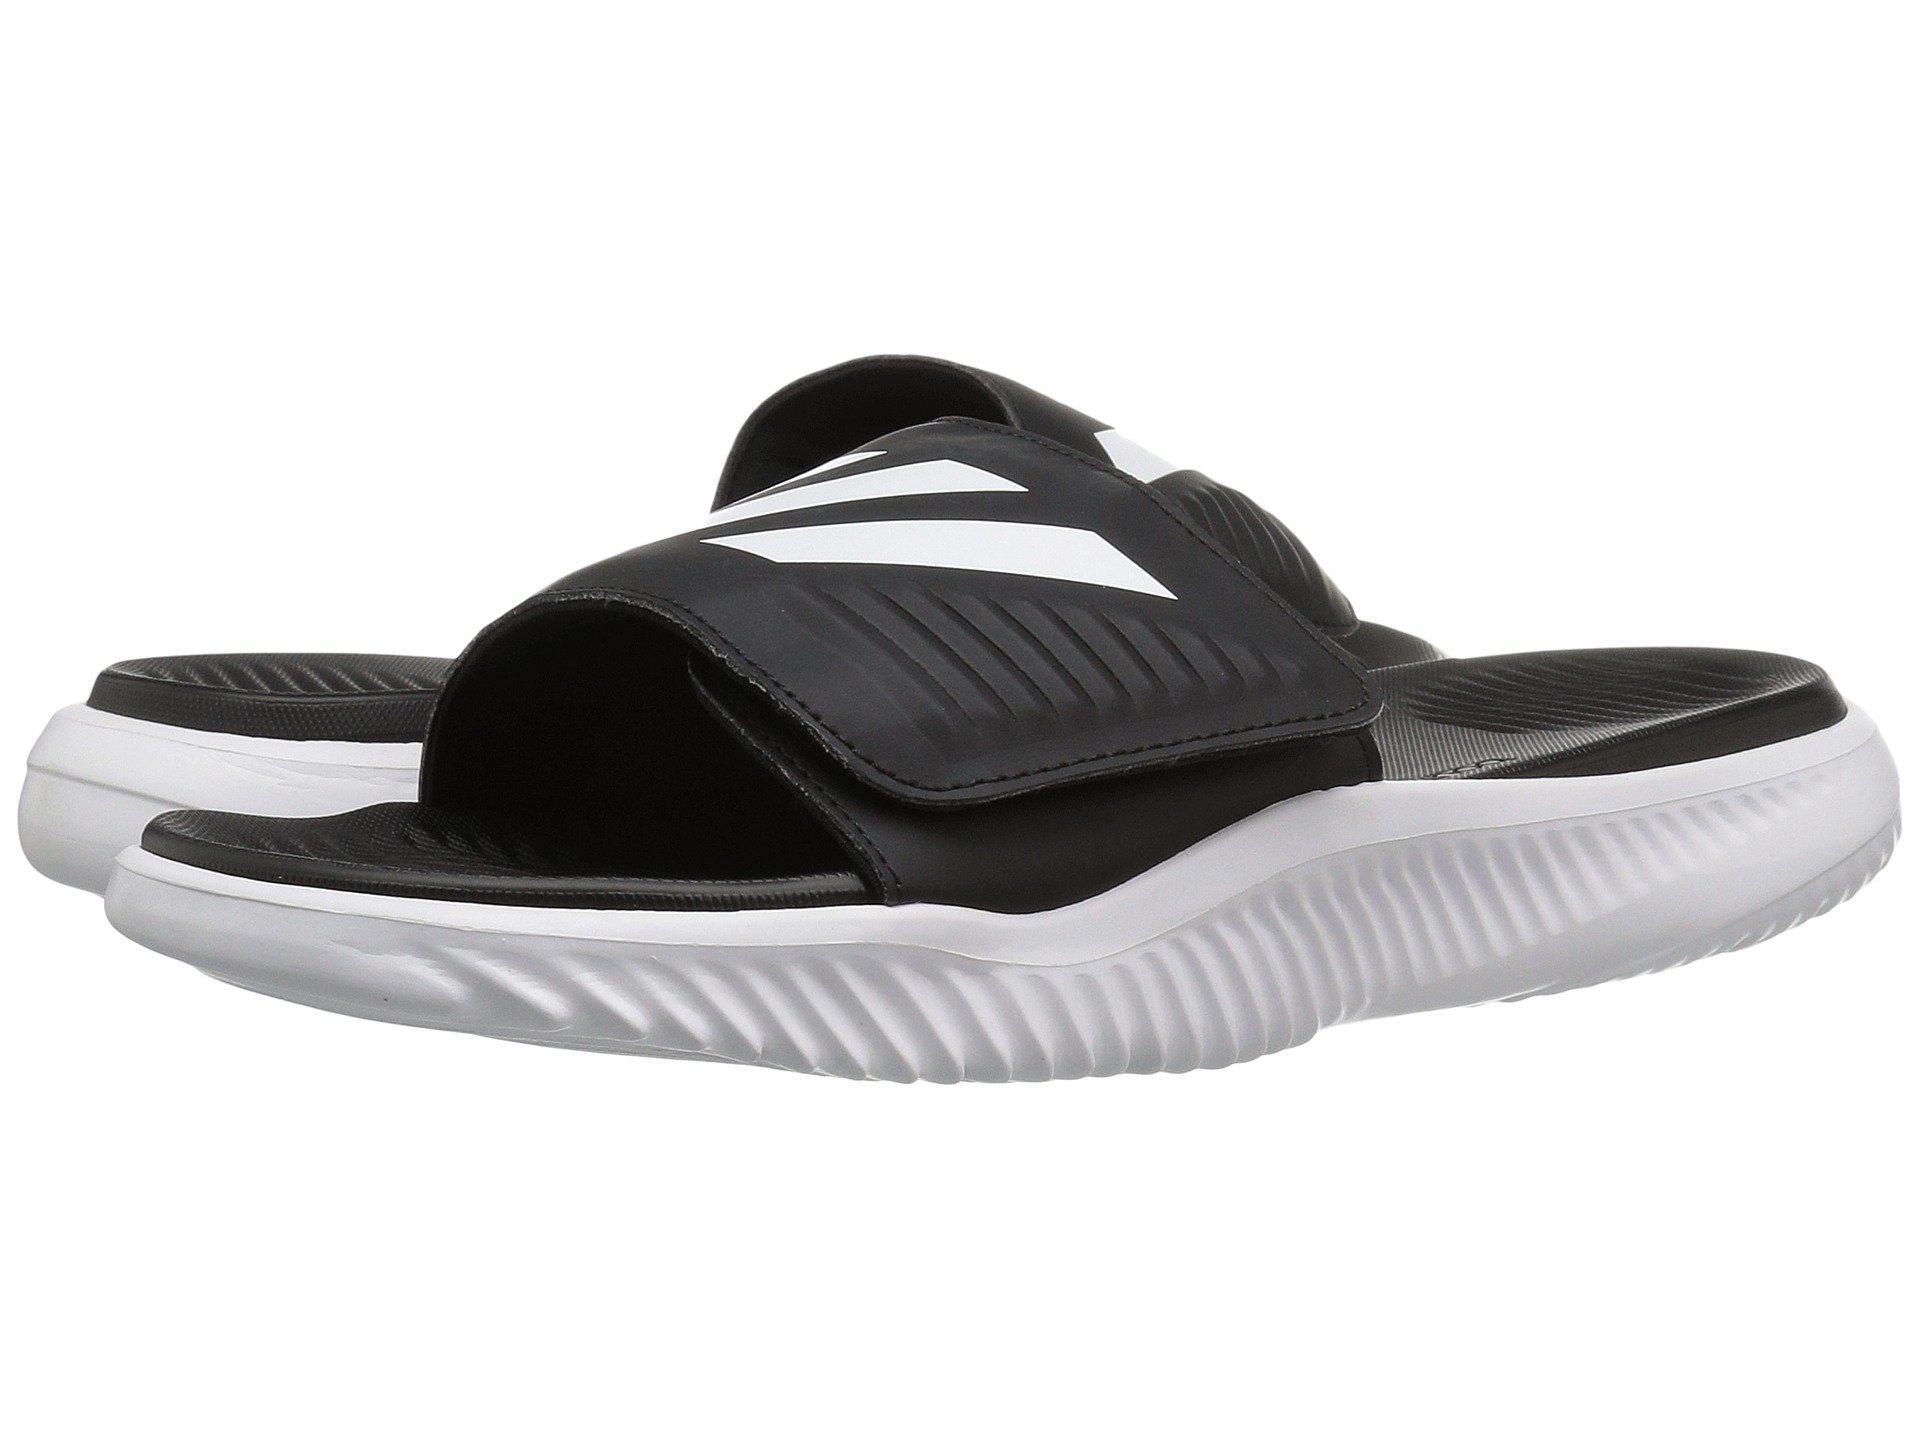 a97cb51e56962 Lyst - adidas Alphabounce Slide (black black) Men s Slide Shoes in ...